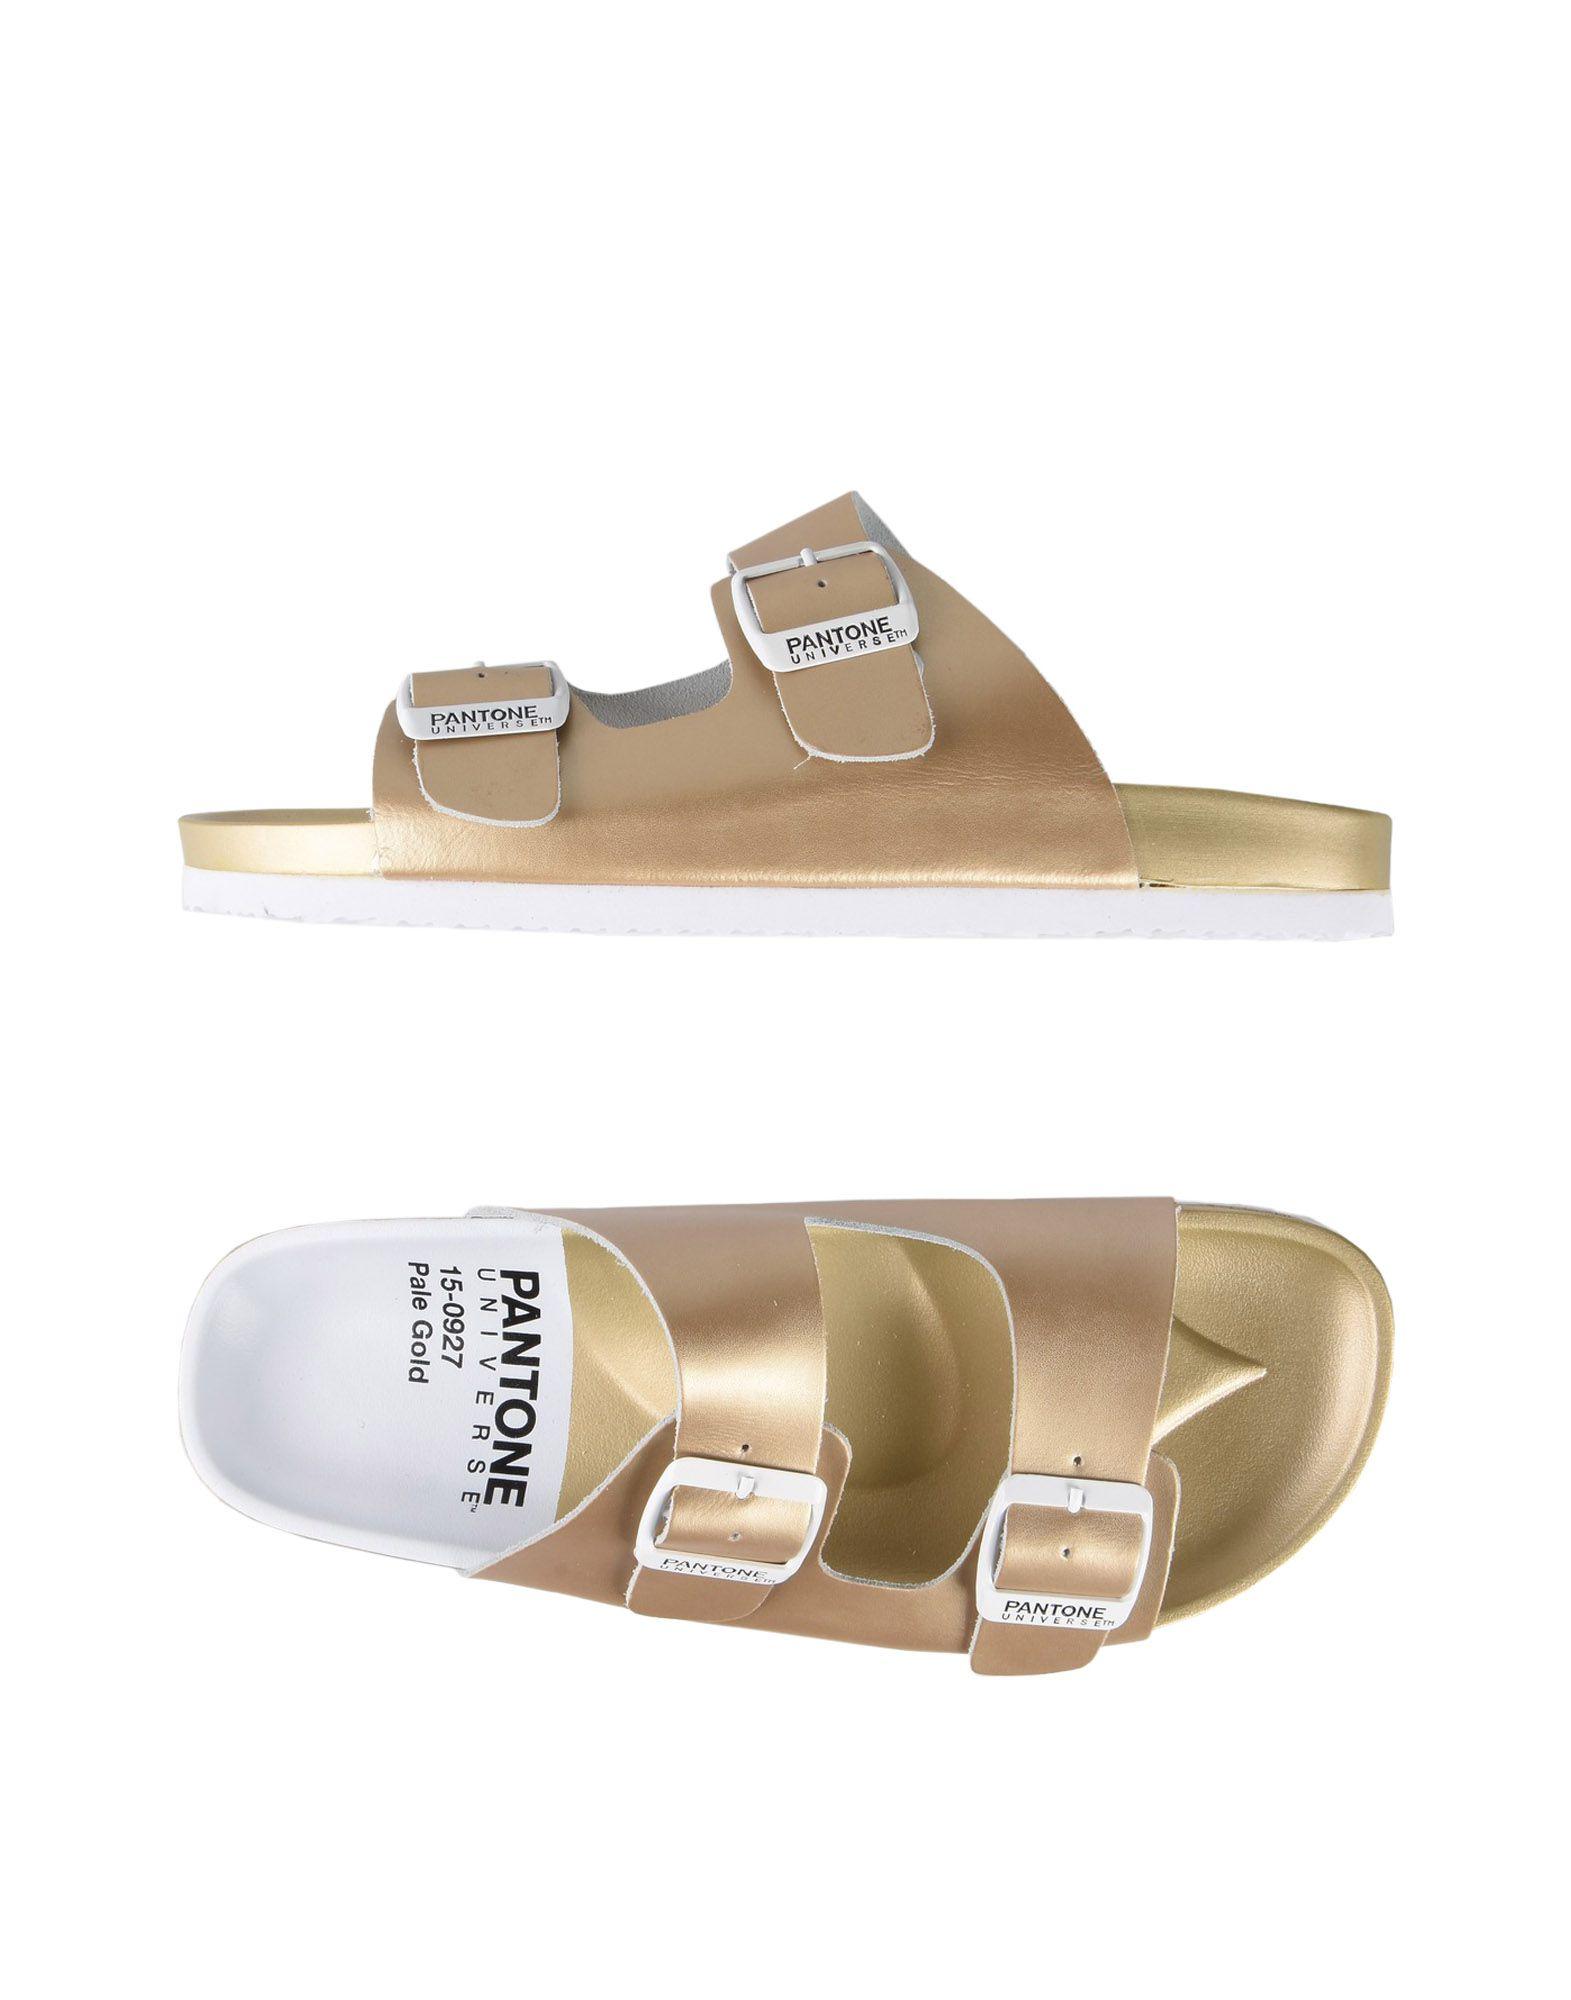 Pantone Chaussures Univers Whitehaven Orteil Sandale Post zE3tKKOlP